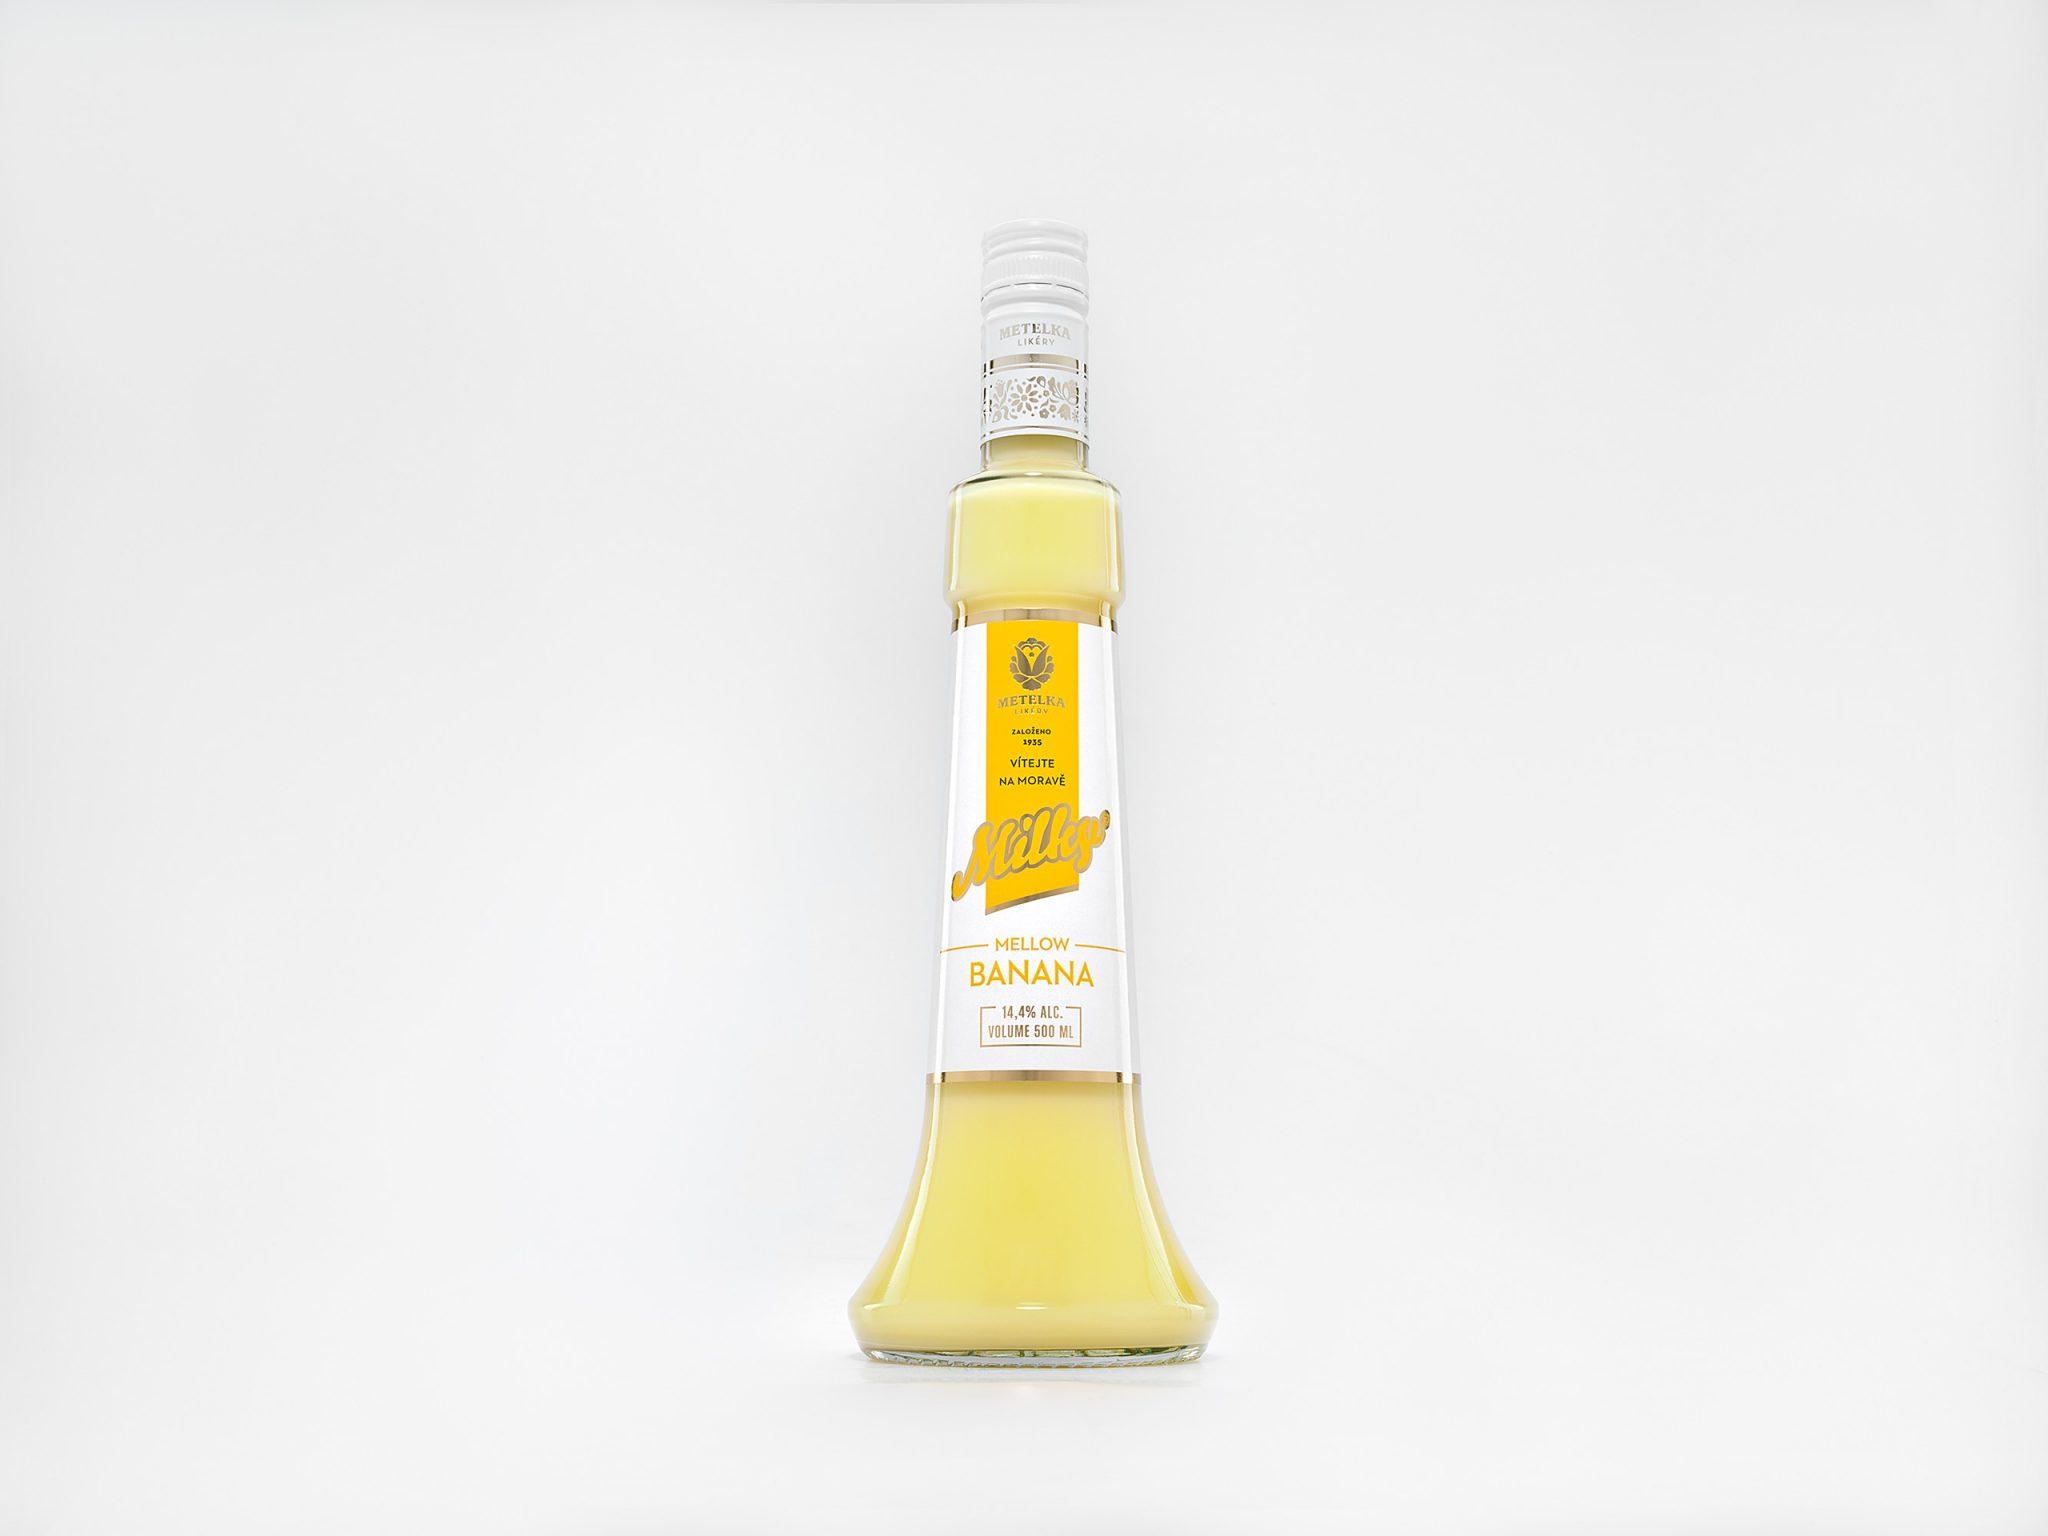 Banánový alkoholický nápoj – Milky Mellow Banana 0,5 L